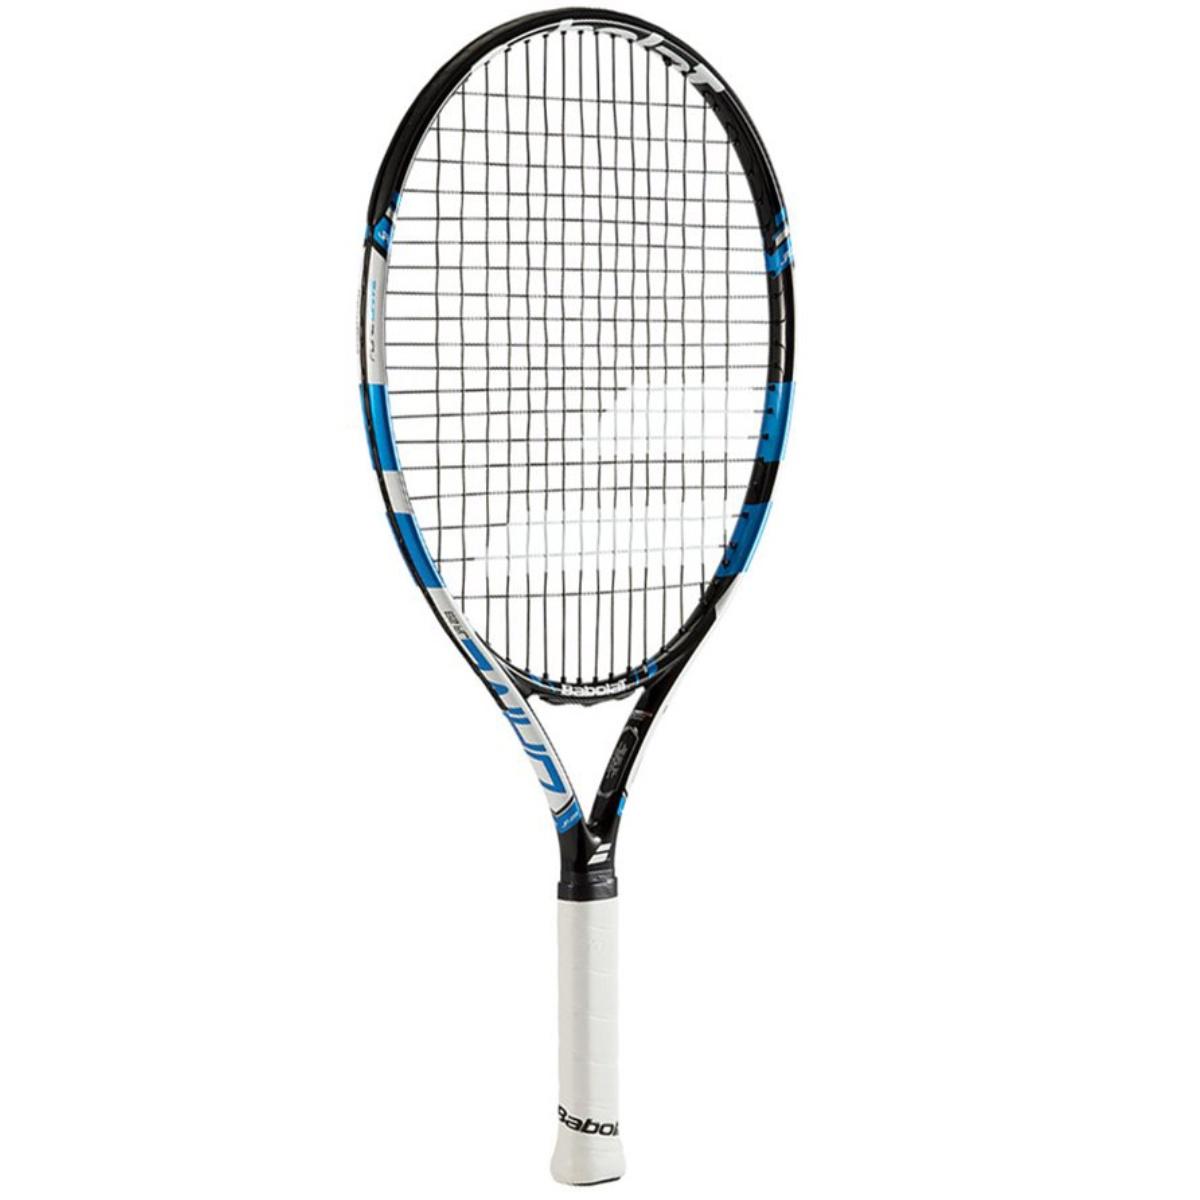 Tenisová raketa BABOLAT Pure Drive Junior 2016 modrá - vel. 23